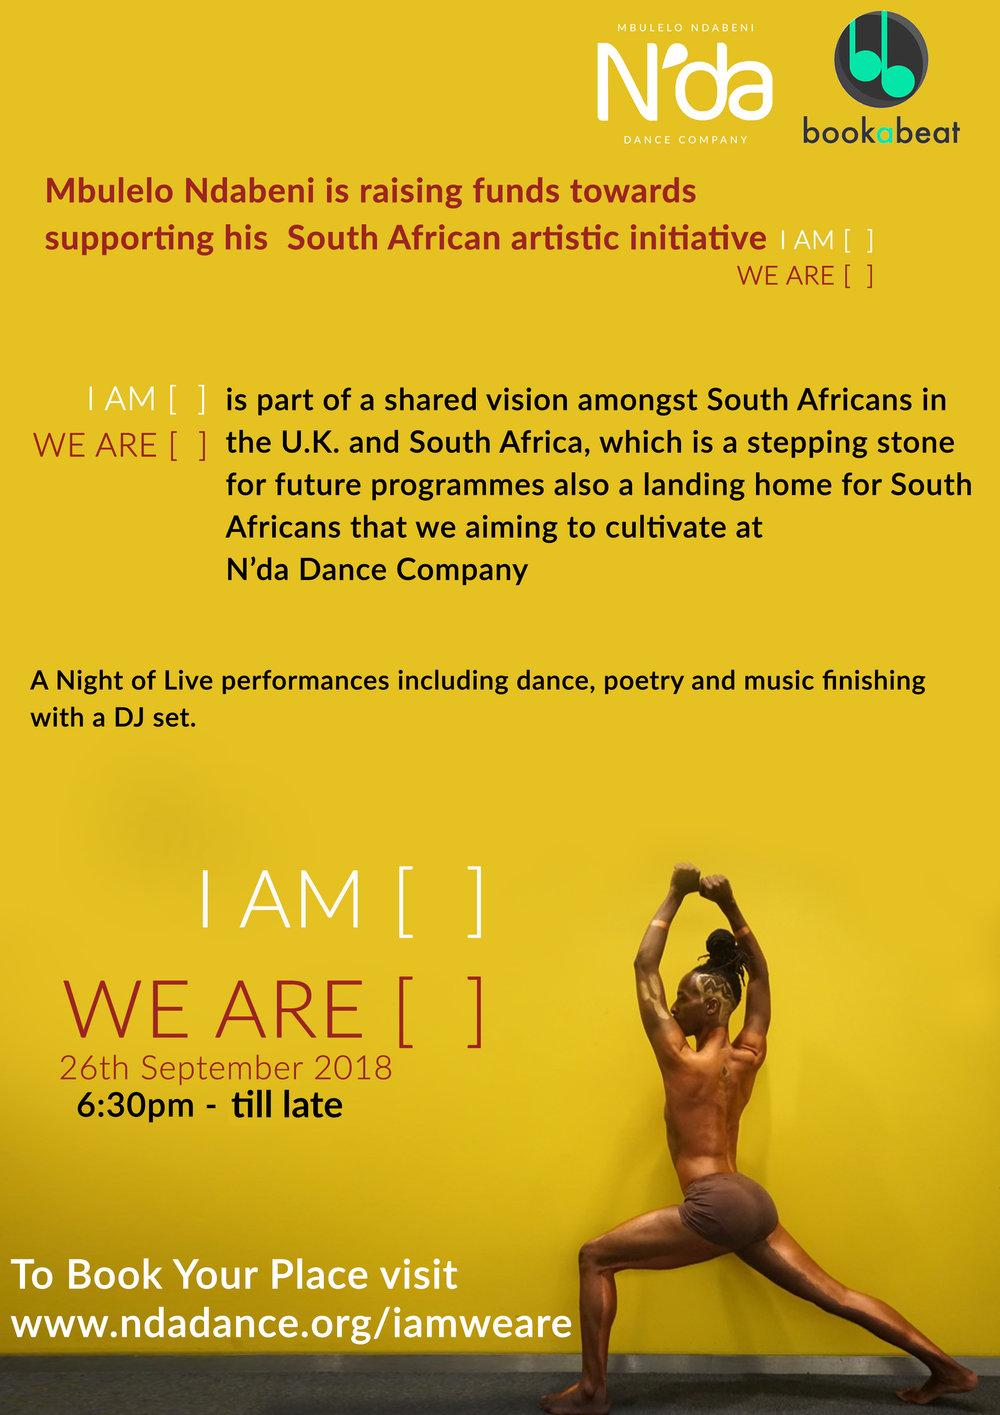 Mbulelo Ndabeni South Africa Trip Fundraiser